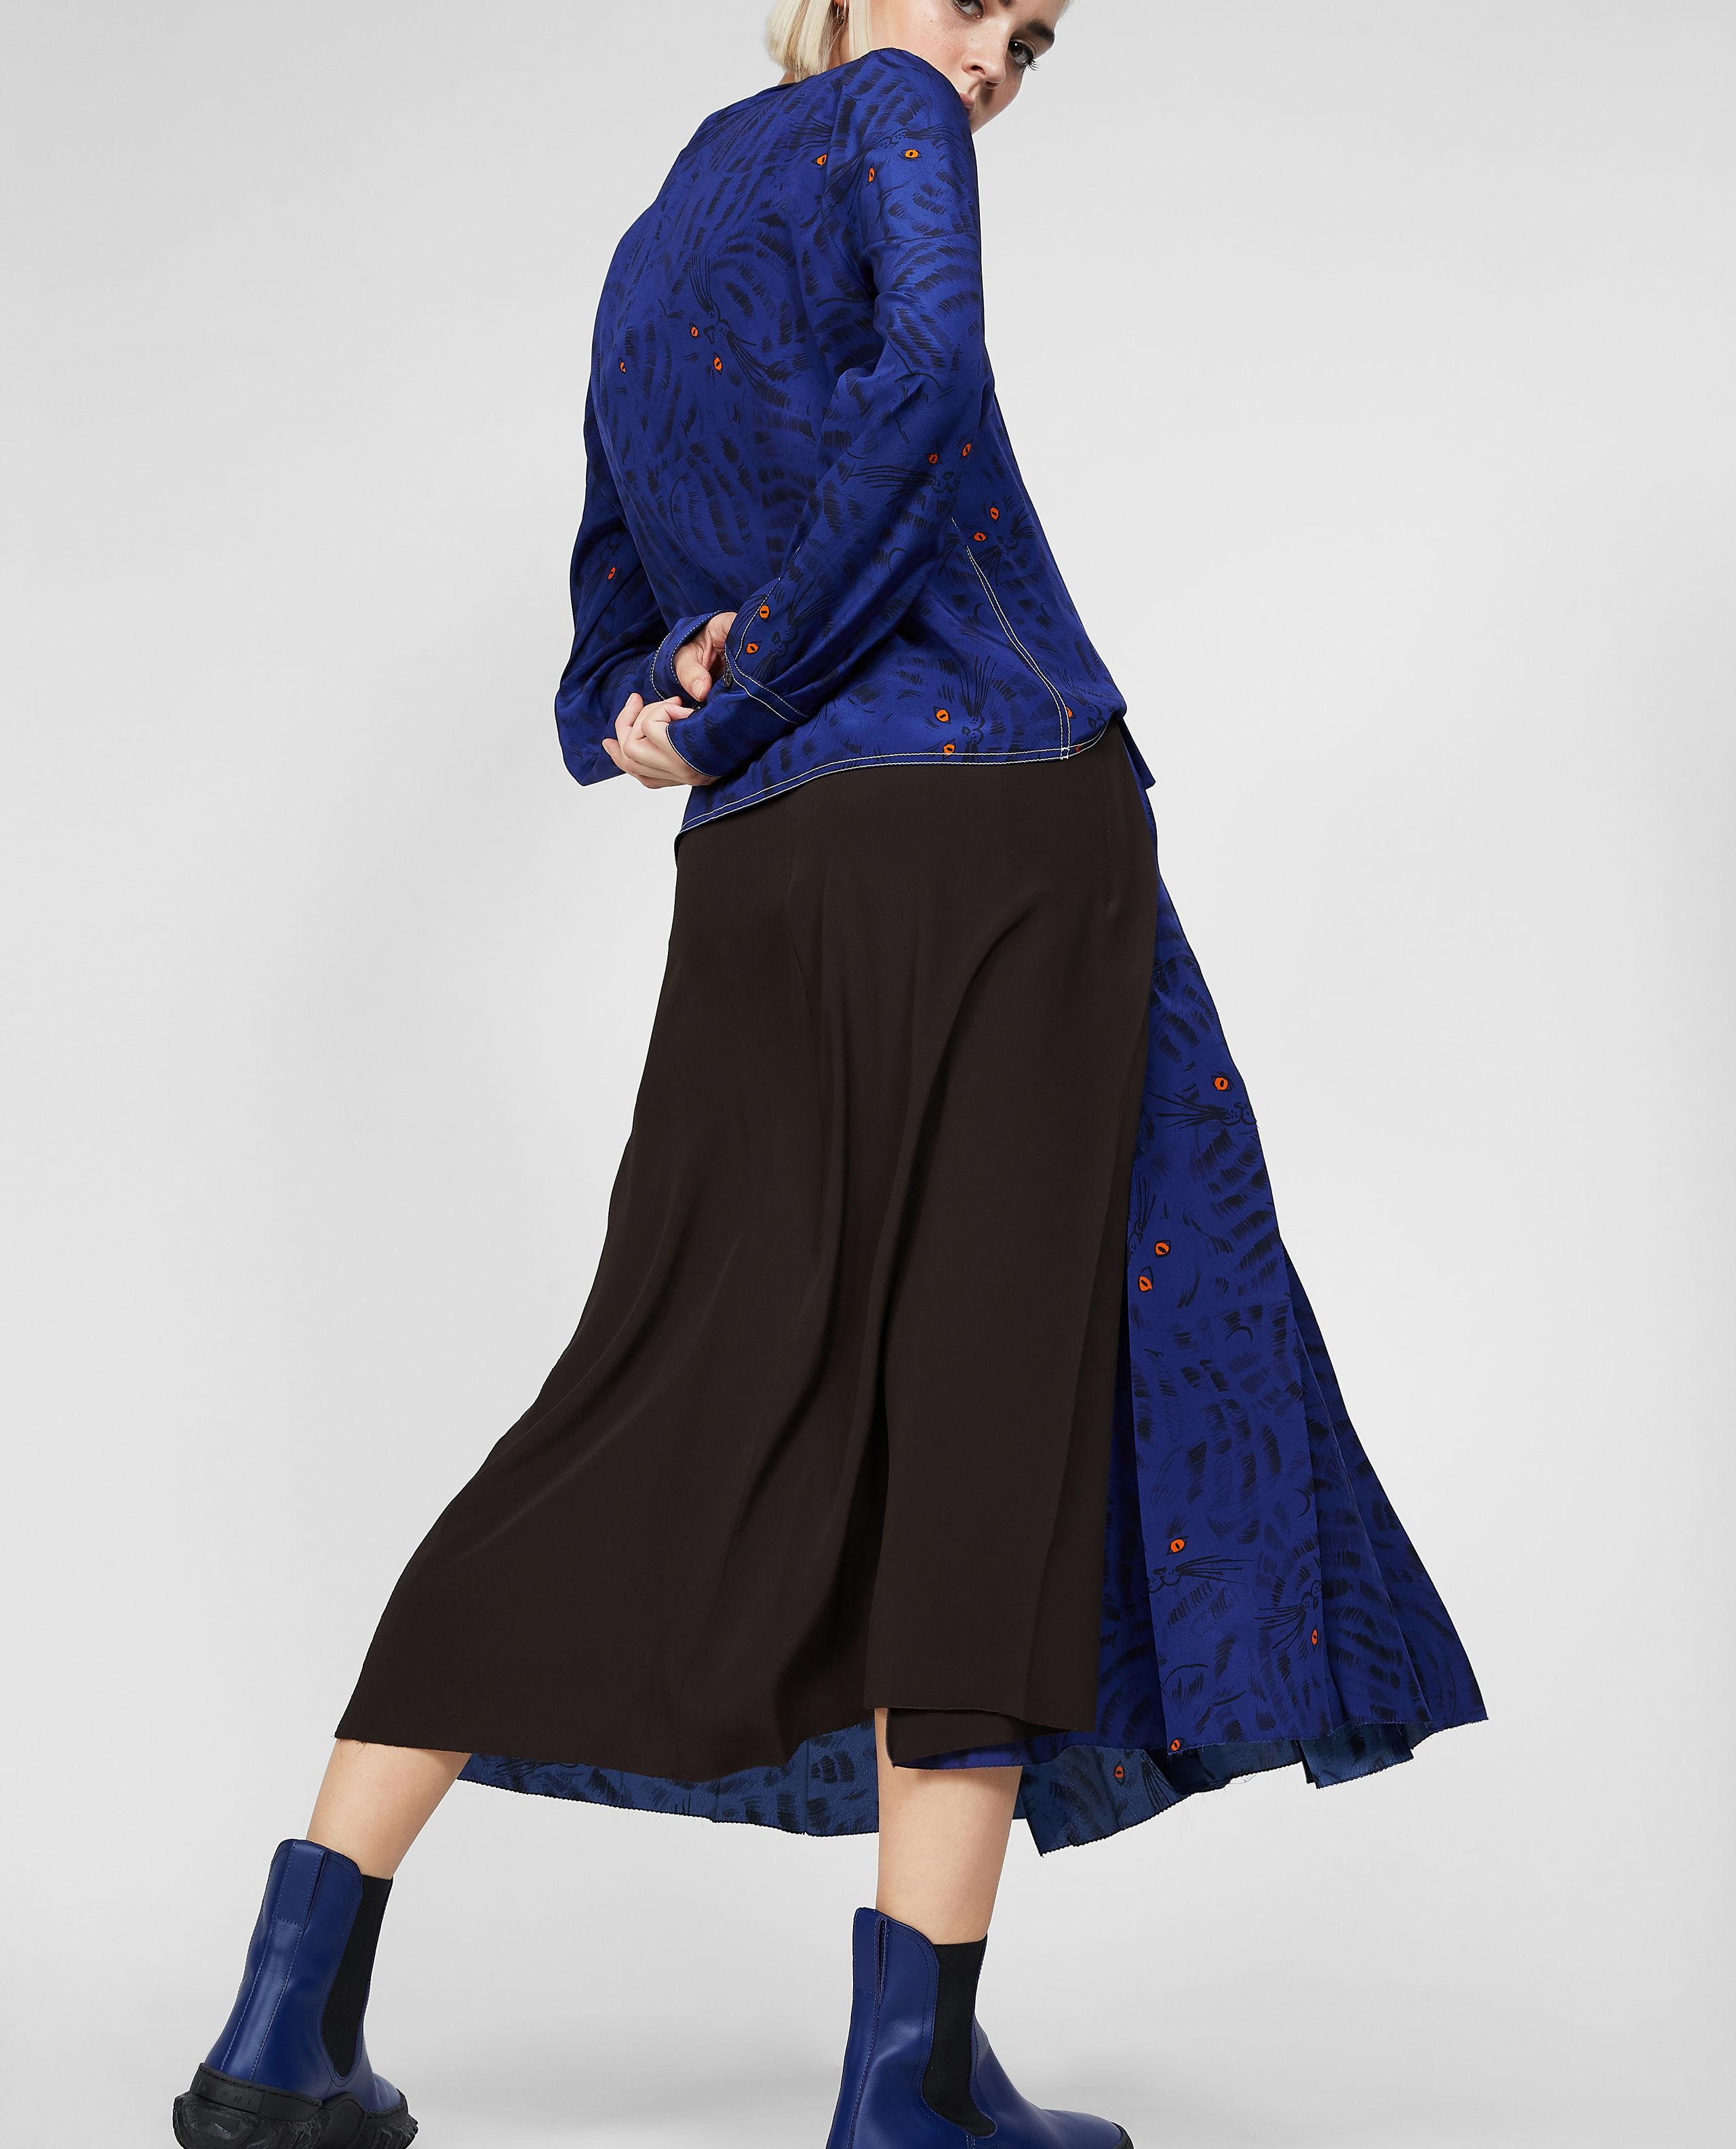 80d95d4da2 Marni Pleated Skirt in Blue - Lyst